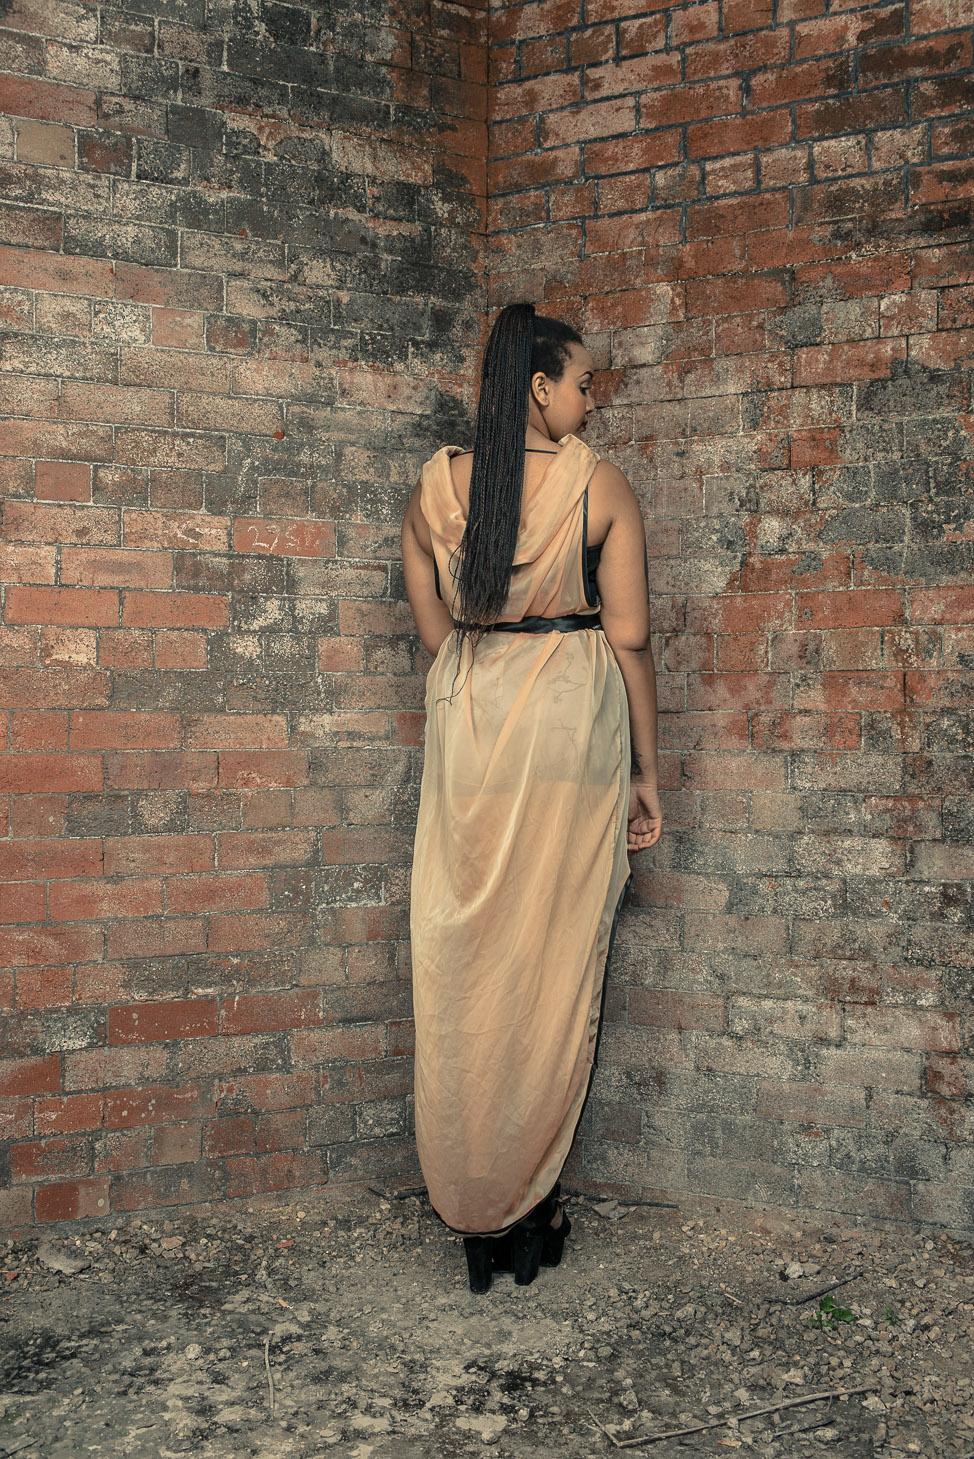 zaramia-ava-zaramiaava-leeds-fashion-designer-ethical-sustainable-tailored-minimalist-sheer-versatile-drape-dress-gold-binding-belt-wrap-cowl-styling-bodysuit-womenswear-models-photoshoot-location-5